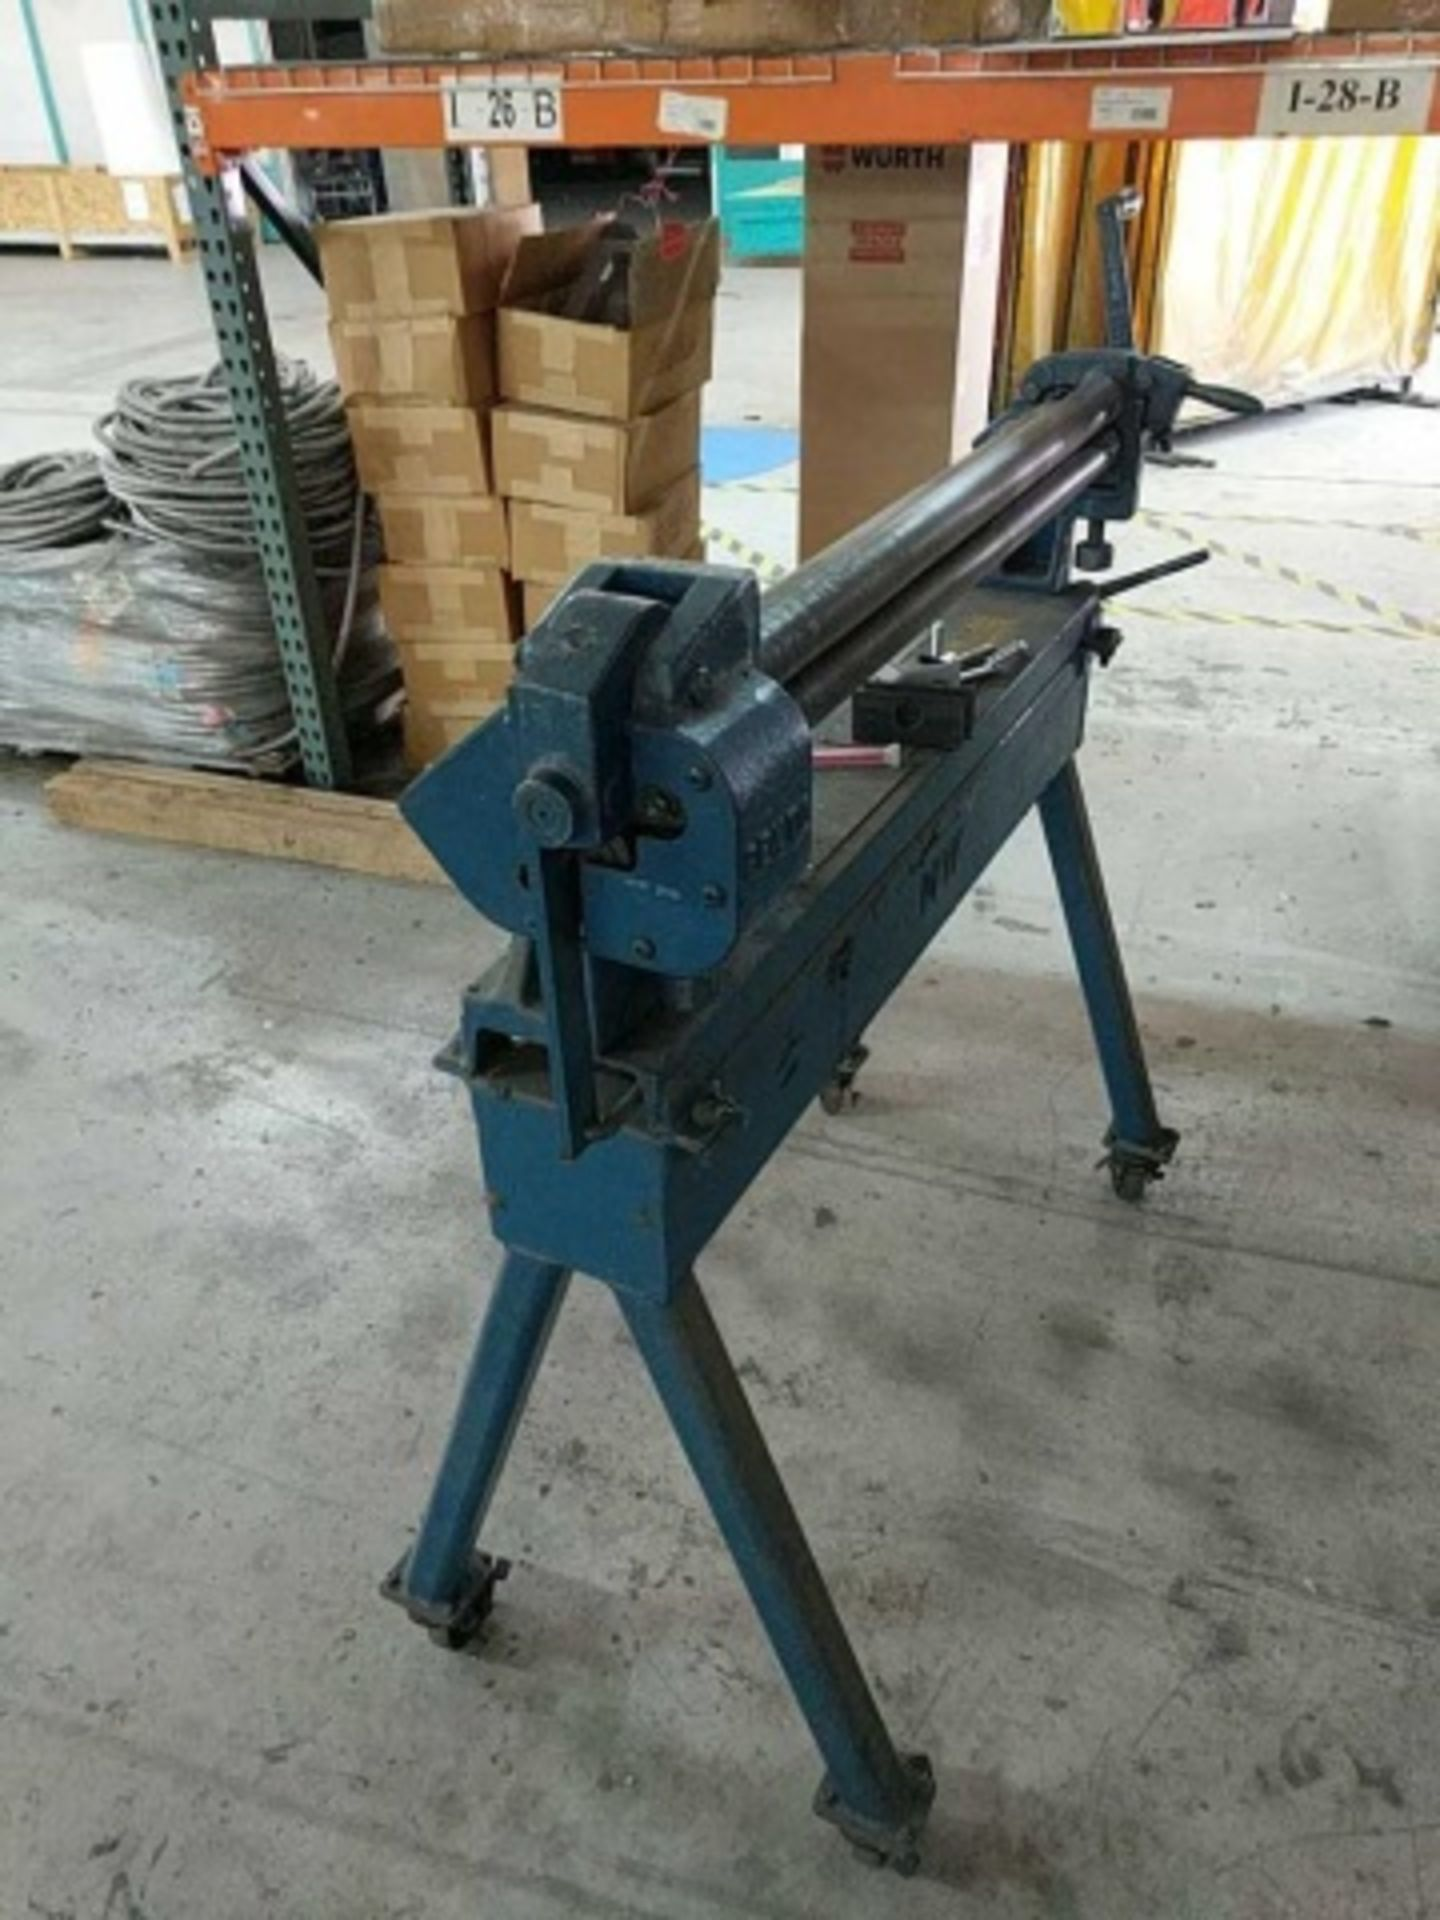 Pexto 381-D Bench Slip Roll Machine - Image 3 of 4